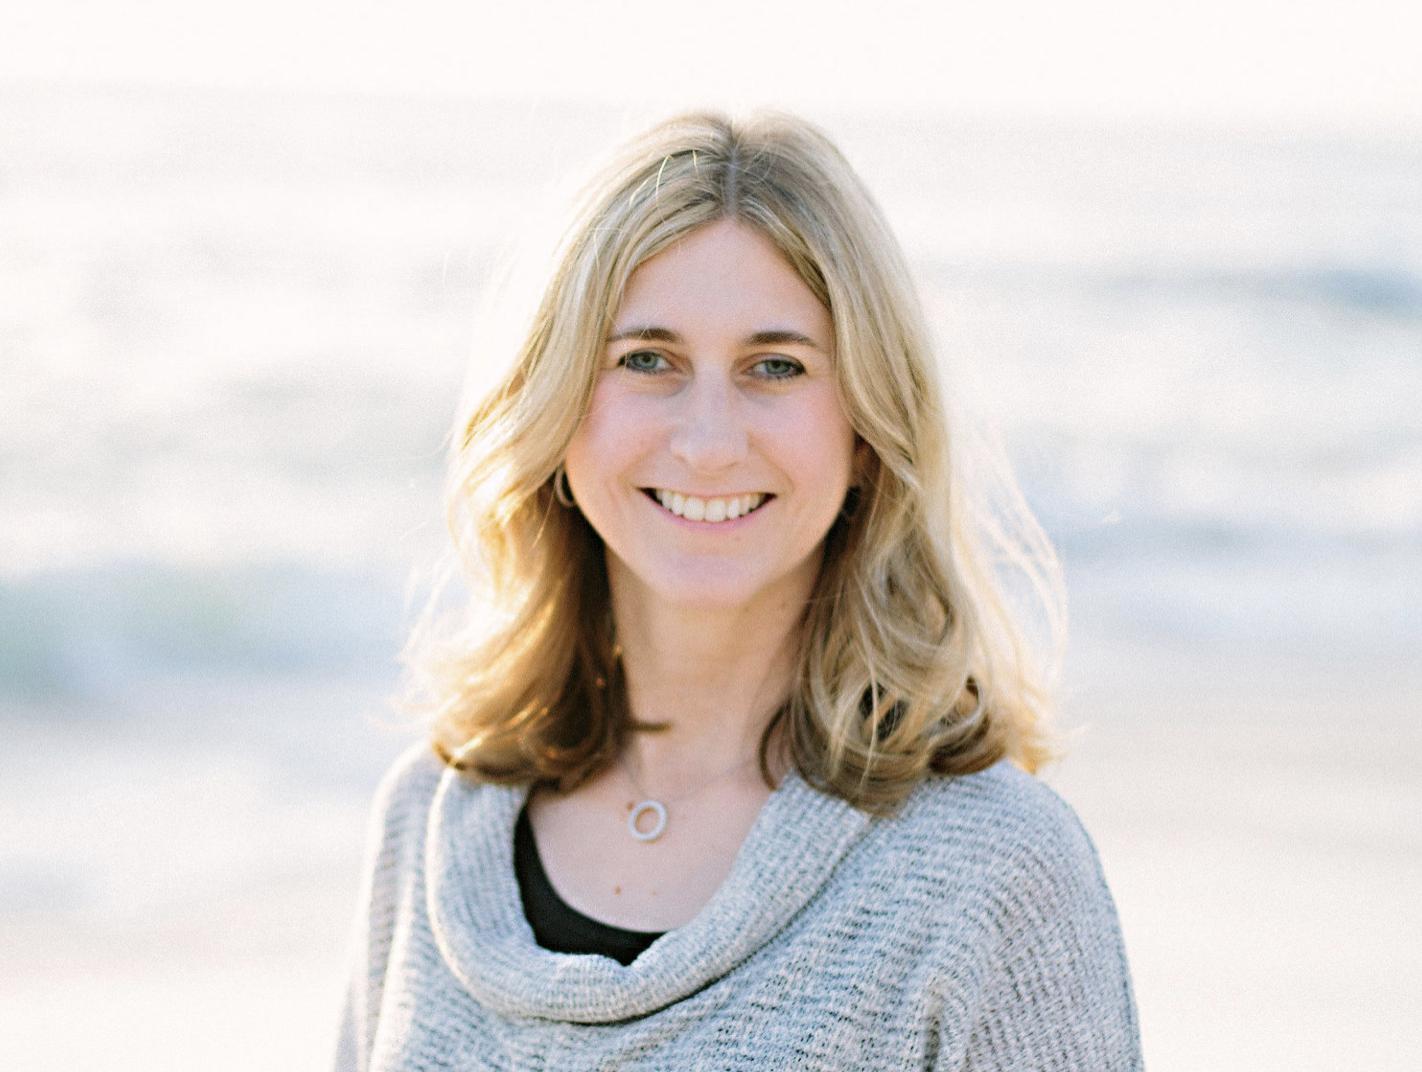 Common ground to promote mental & emotional wellness - Jennifer Costanza